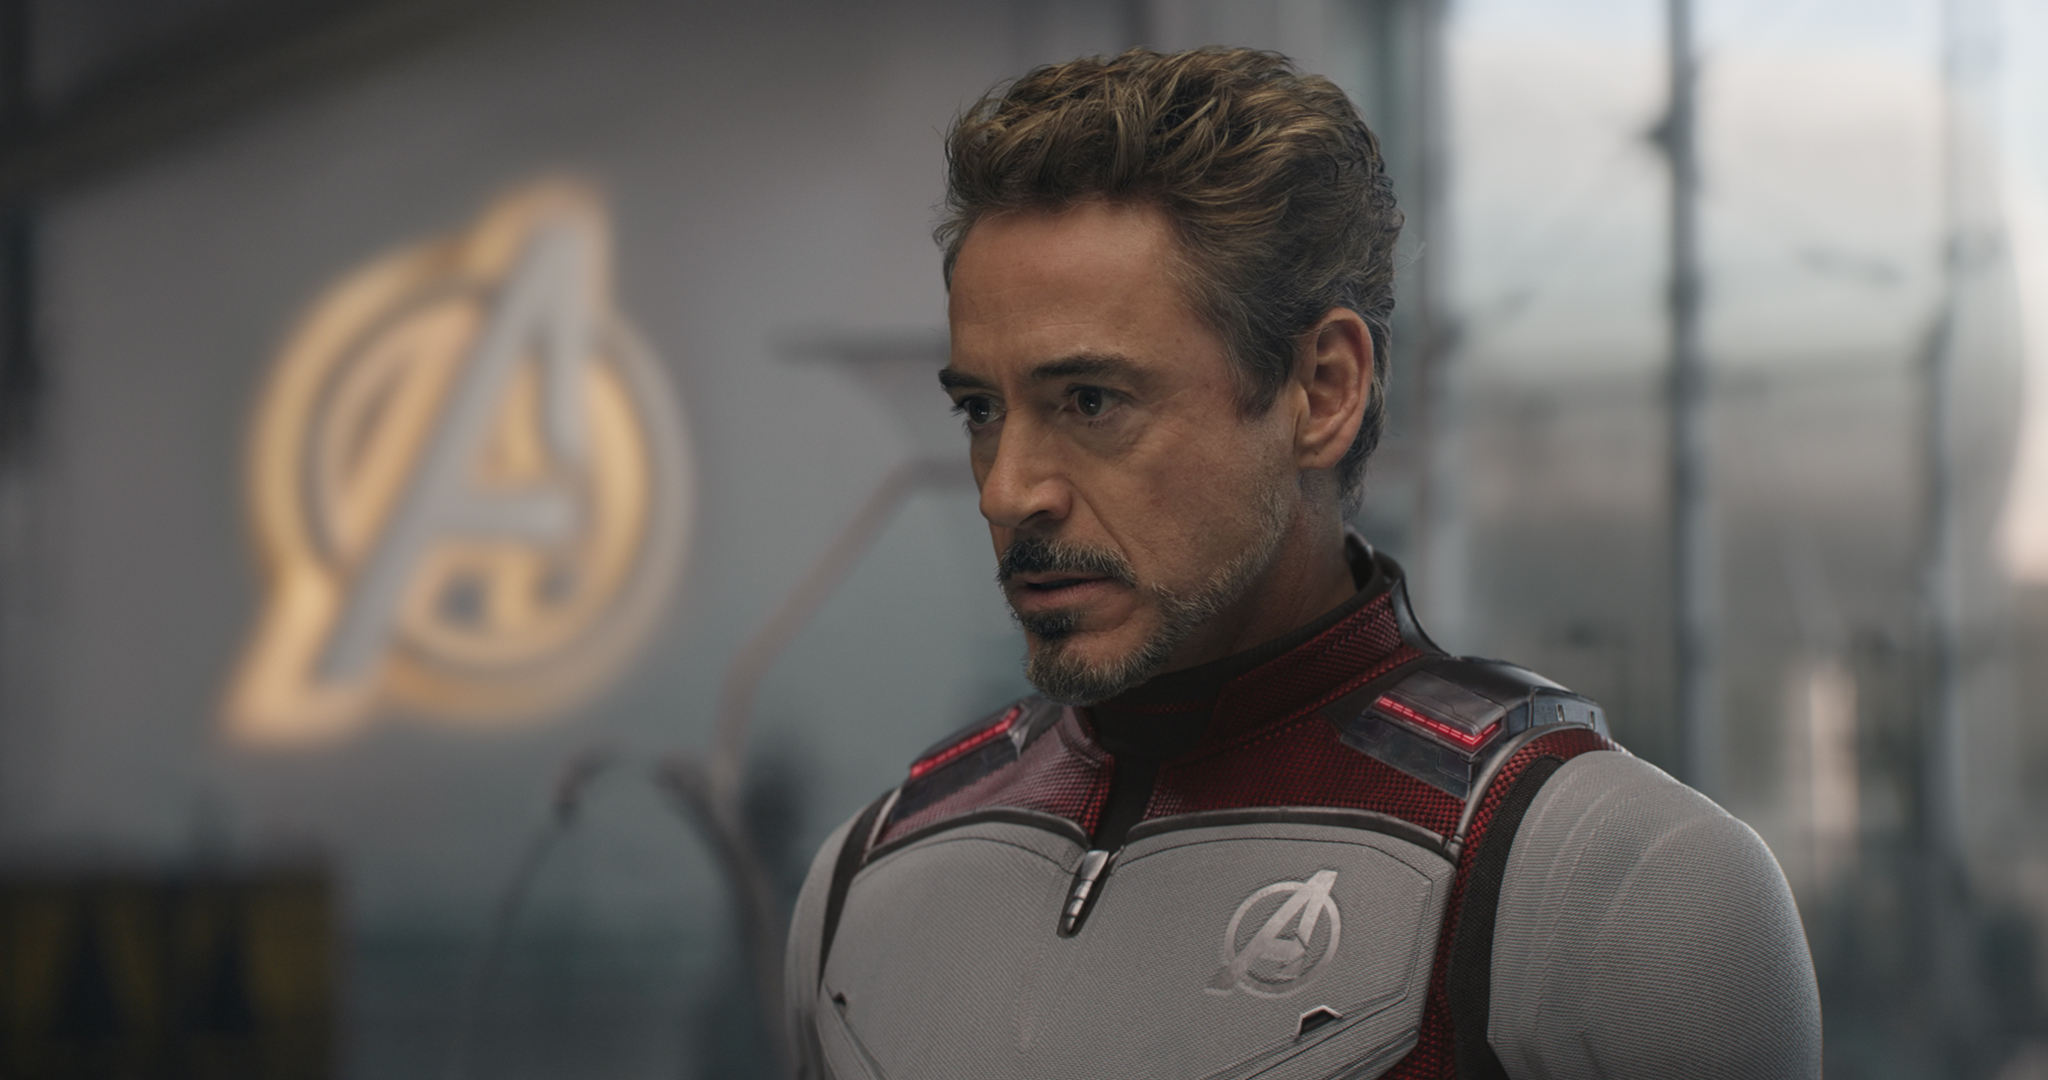 Inicia venta de boletos para el reestreno de 'Avengers: Endgame' en EU